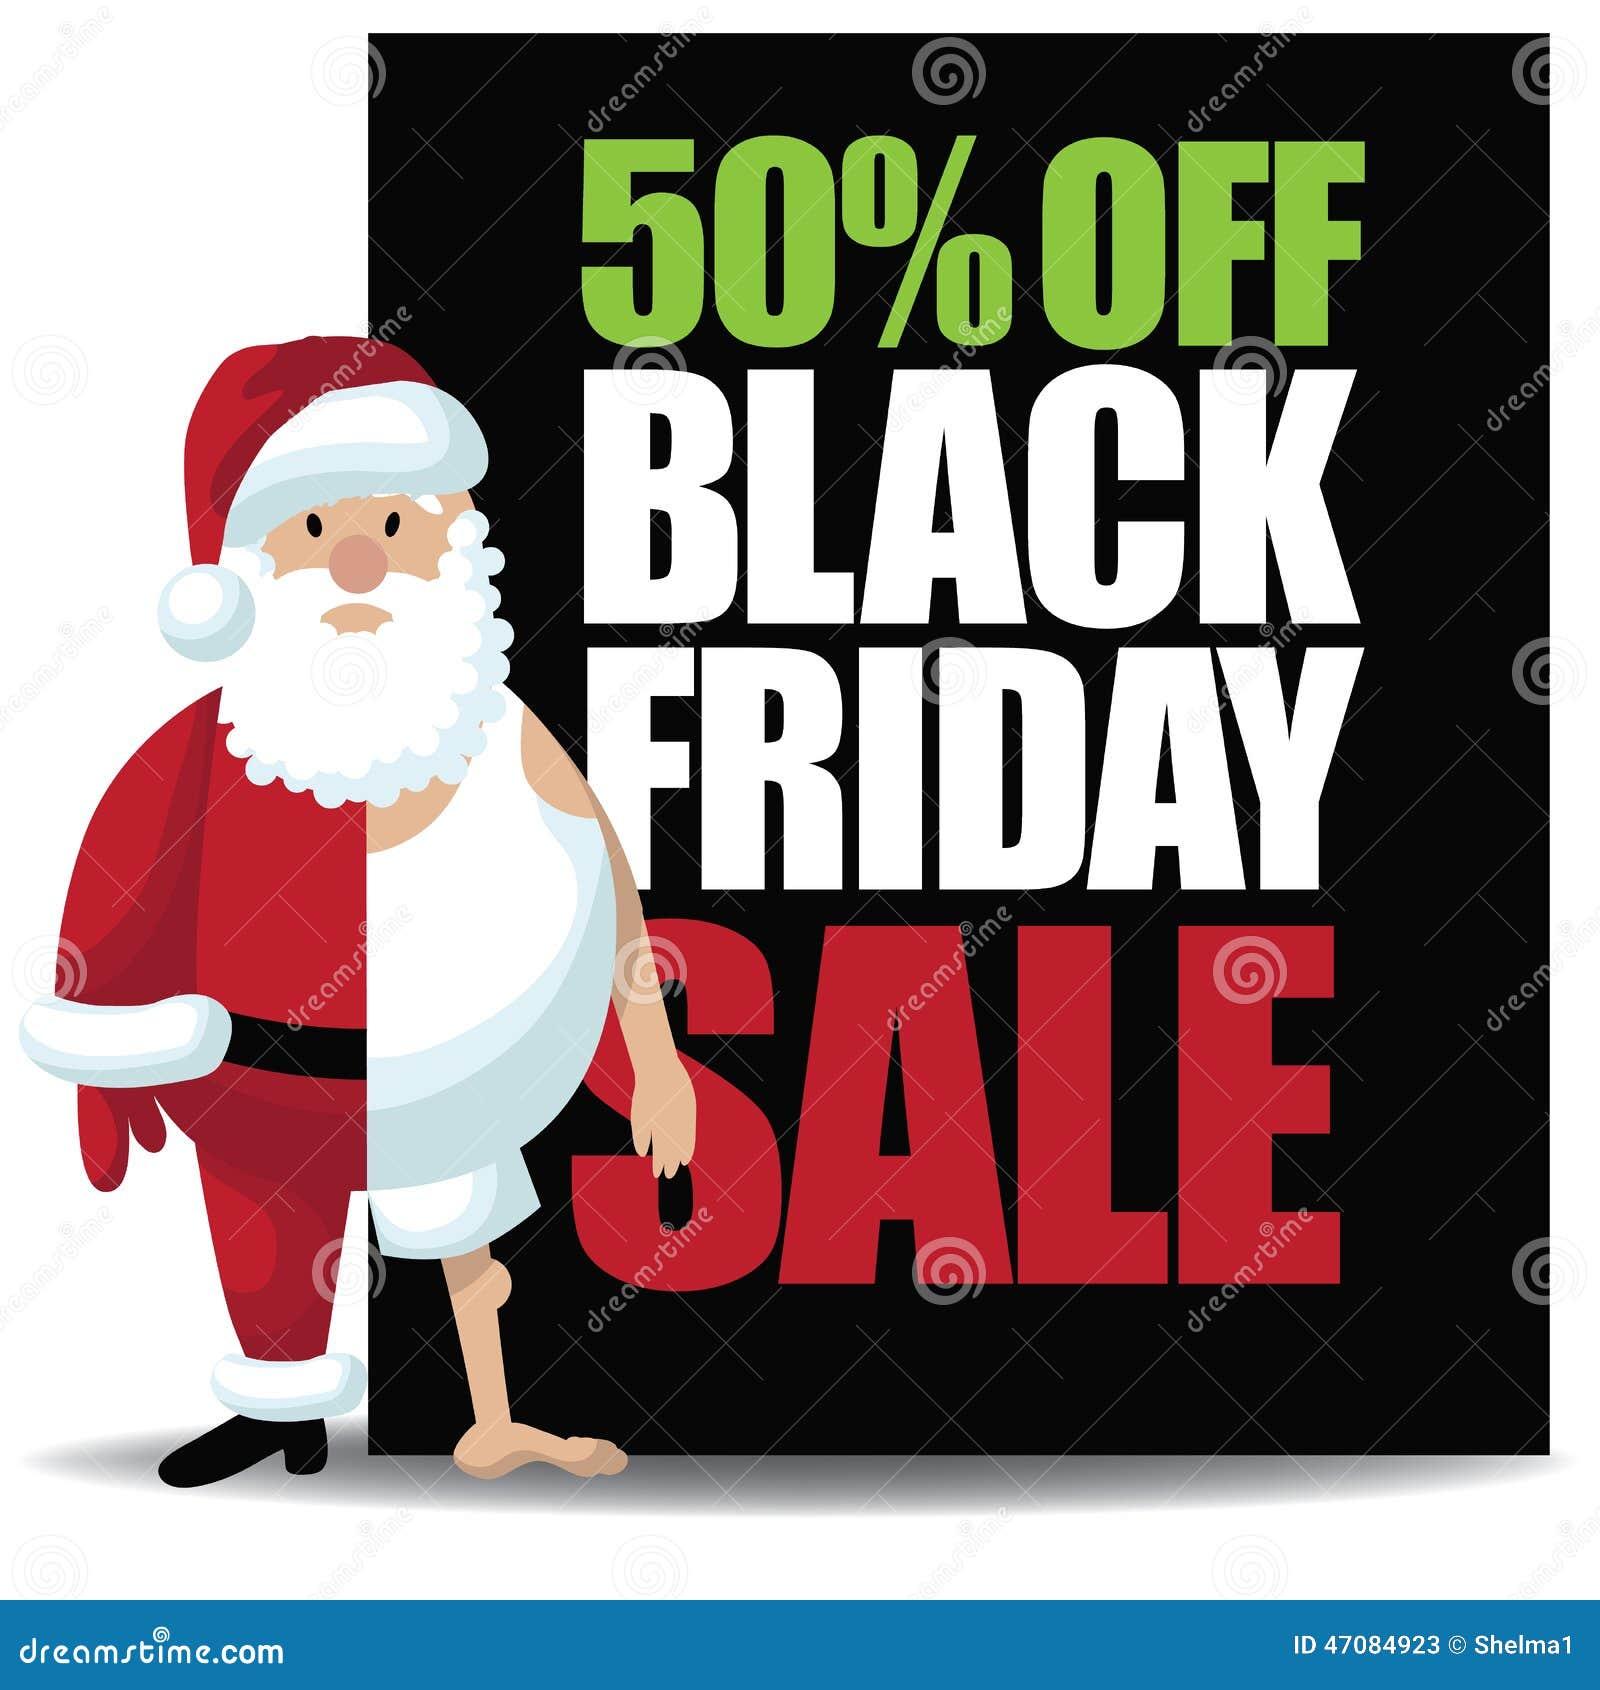 50 Off Black Friday Sale With Half Dressed Santa Stock Vector Illustration Of Card Saint 47084923